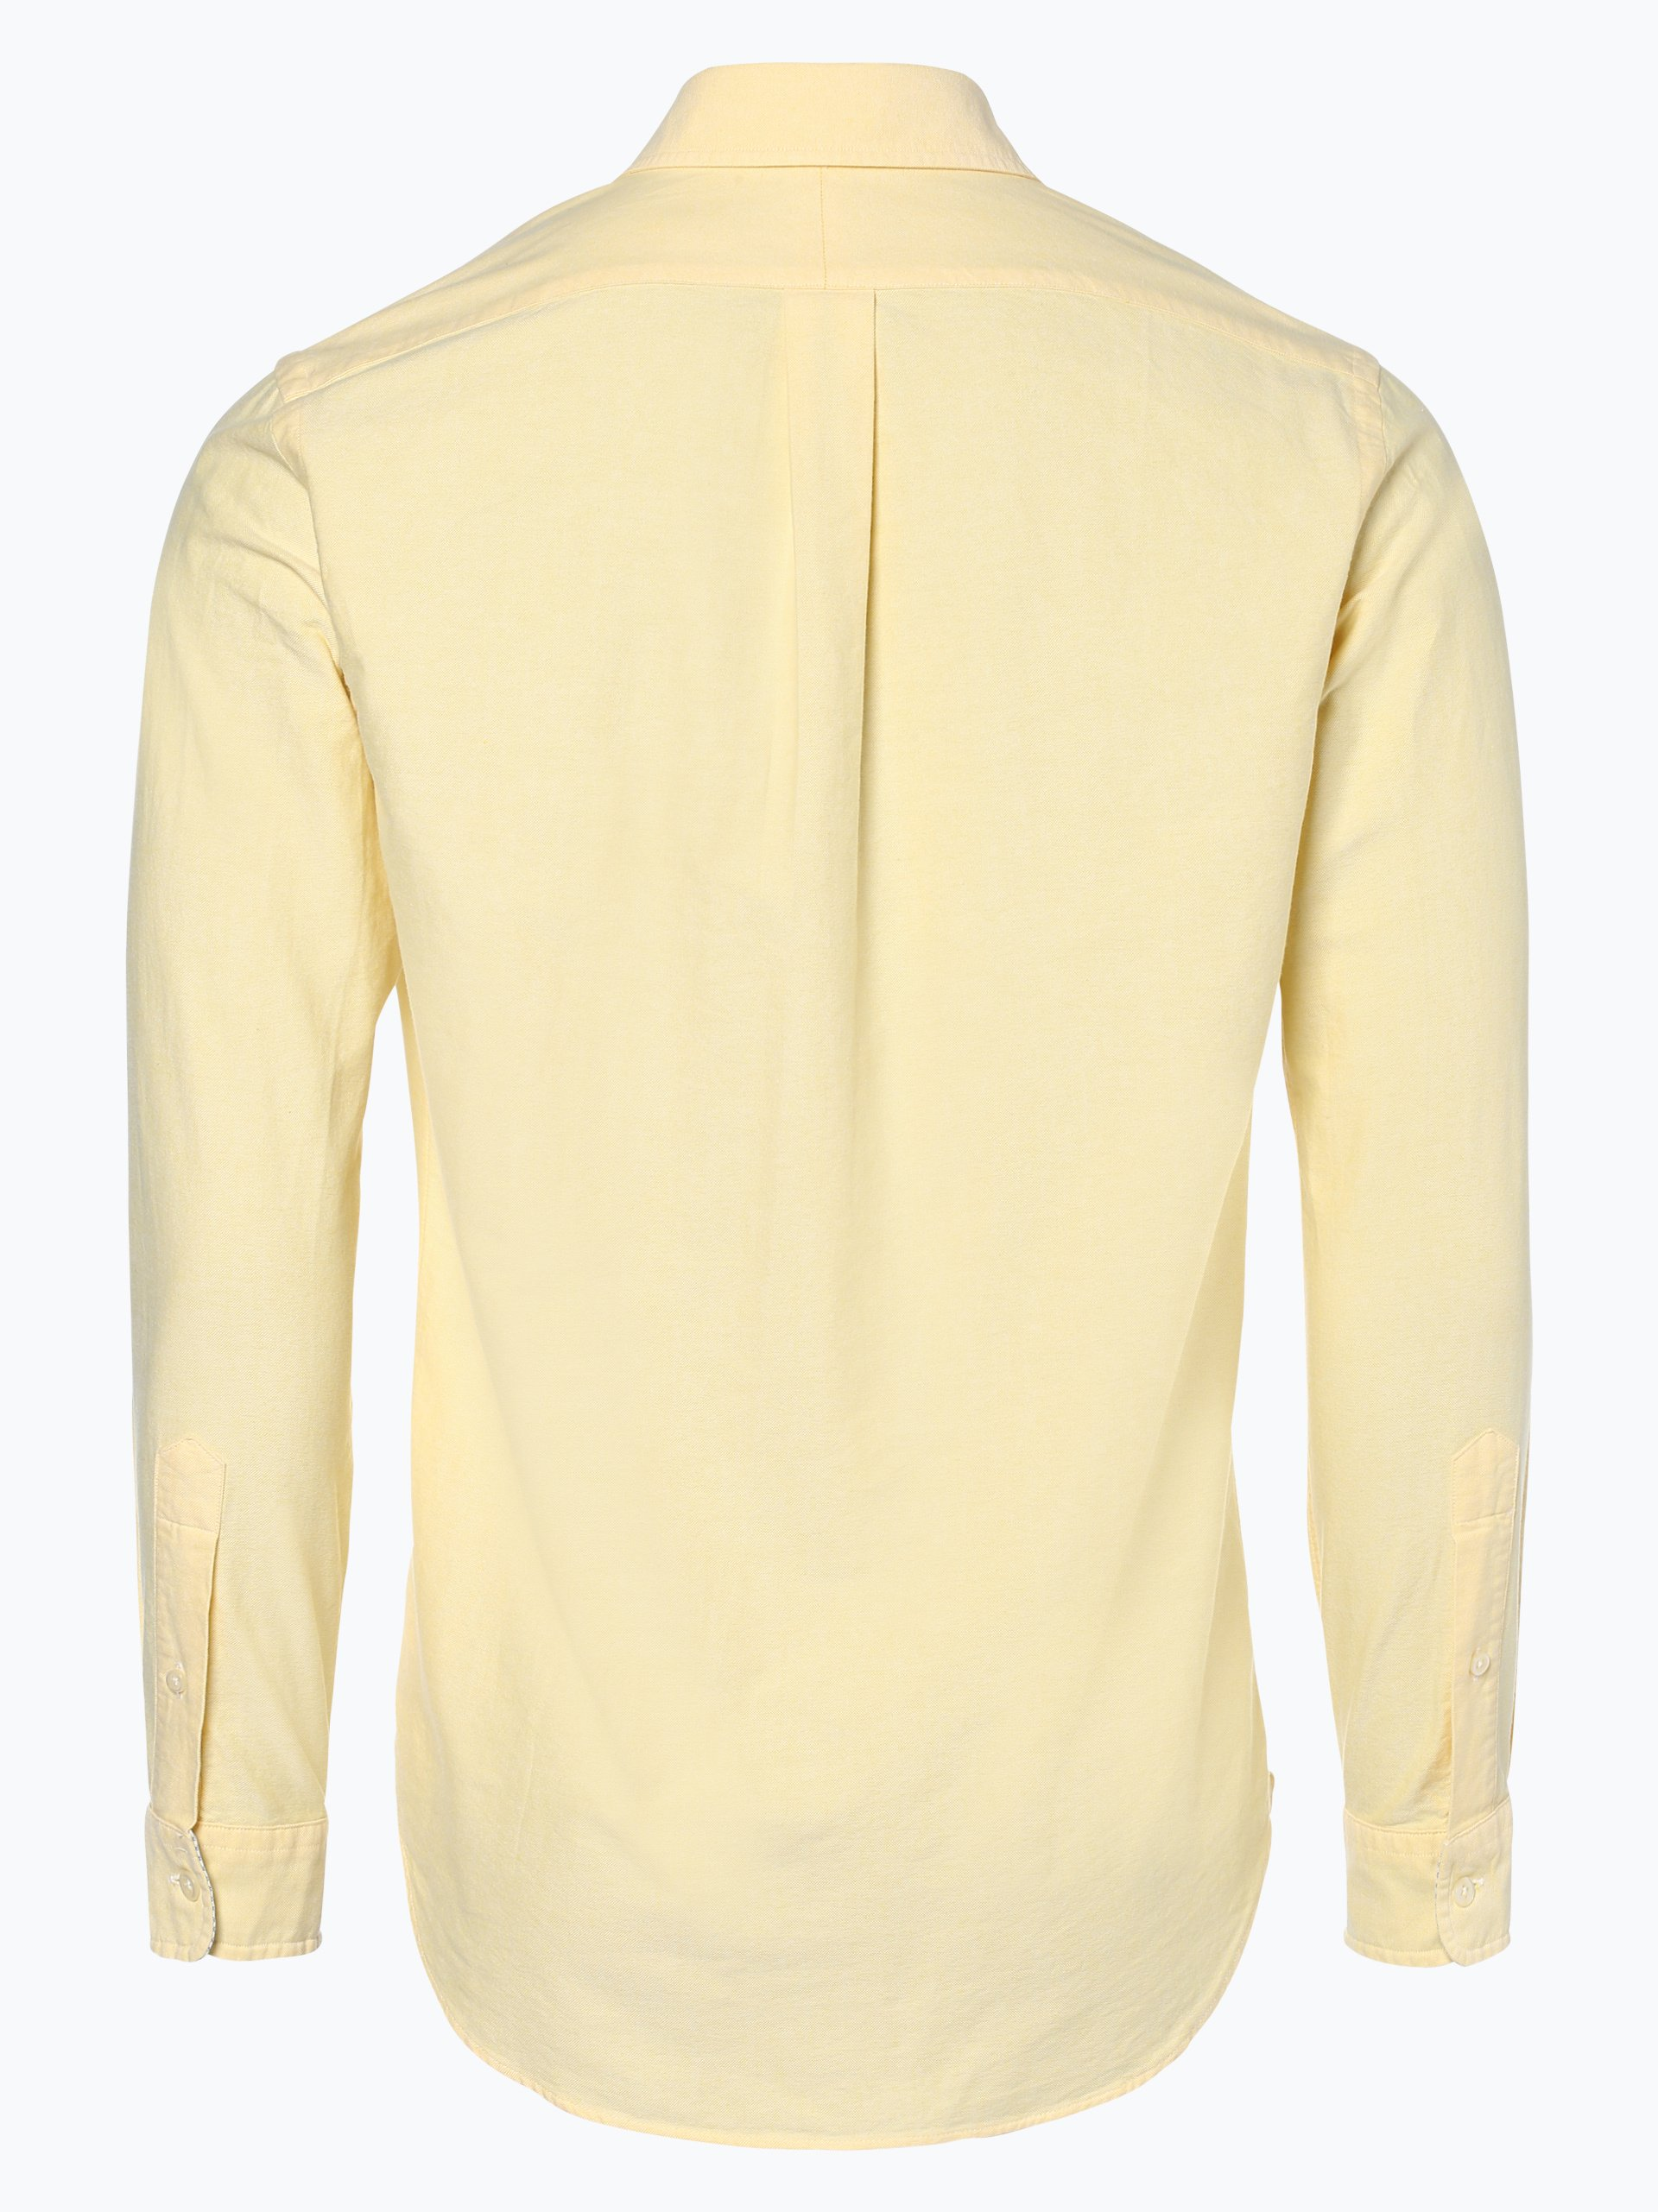 polo ralph lauren herren hemd gelb uni online kaufen peek und cloppenburg de. Black Bedroom Furniture Sets. Home Design Ideas